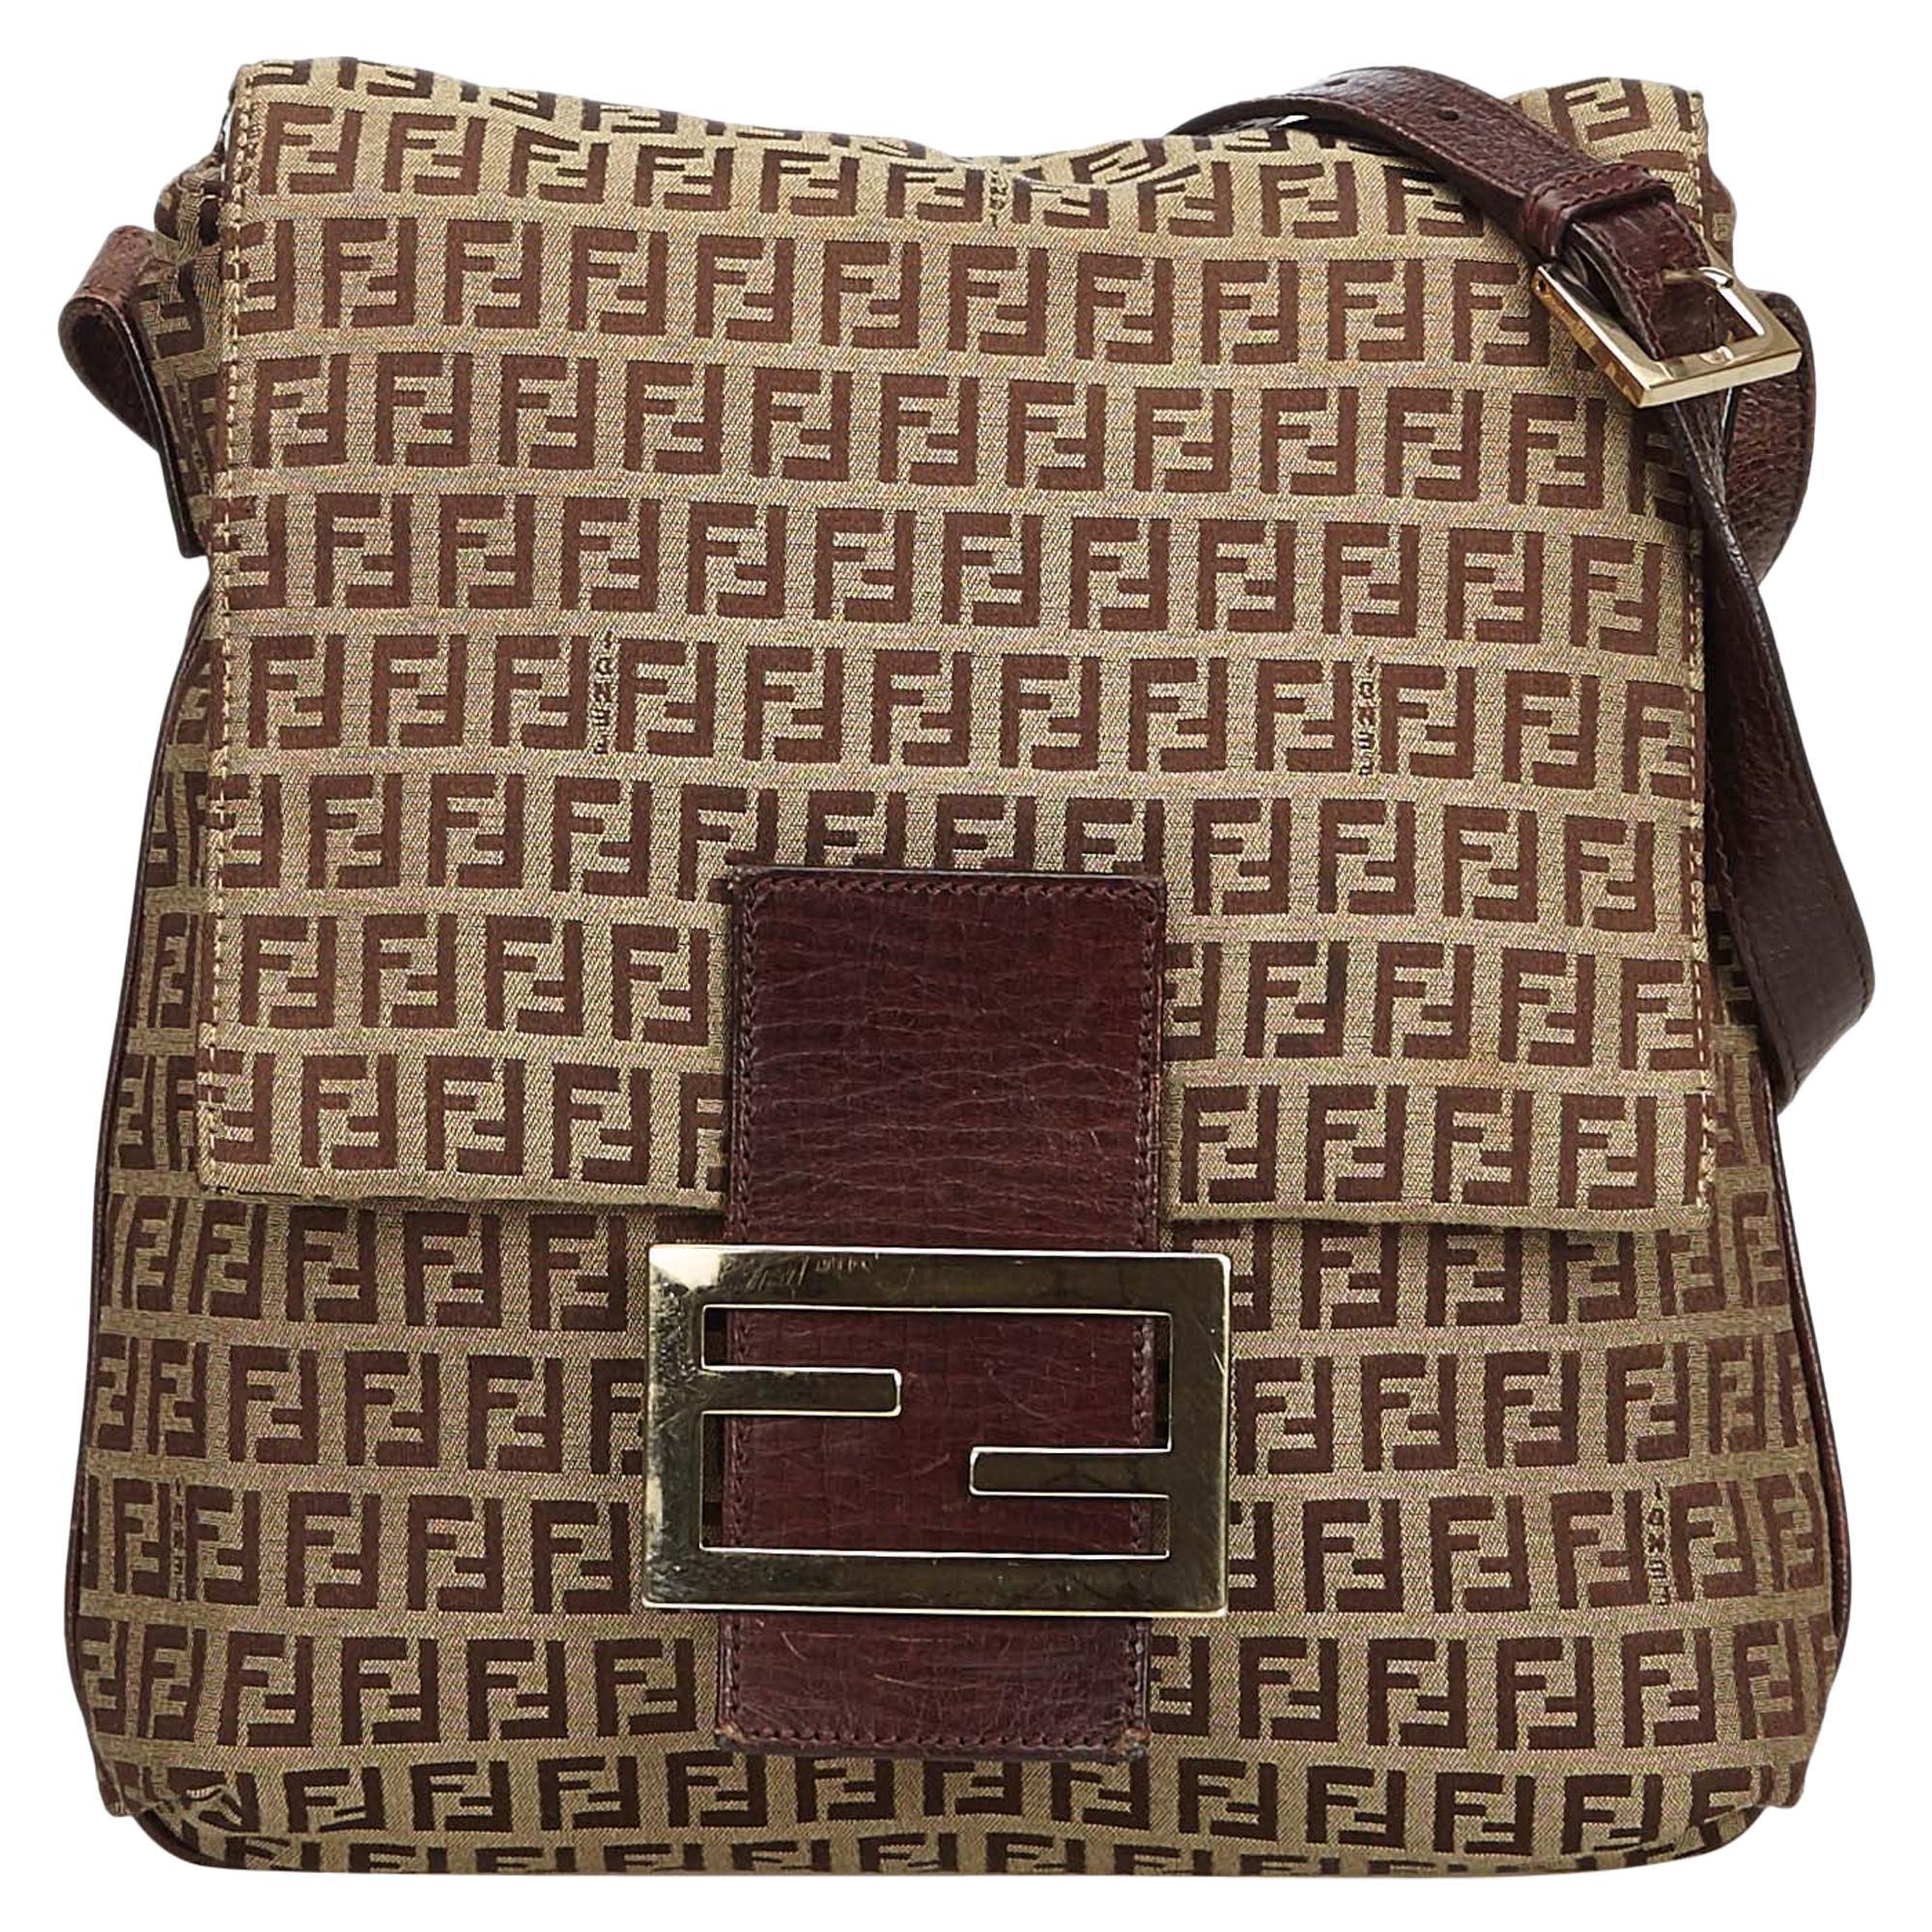 bc073f34 Vintage Fendi Handbags and Purses - 967 For Sale at 1stdibs